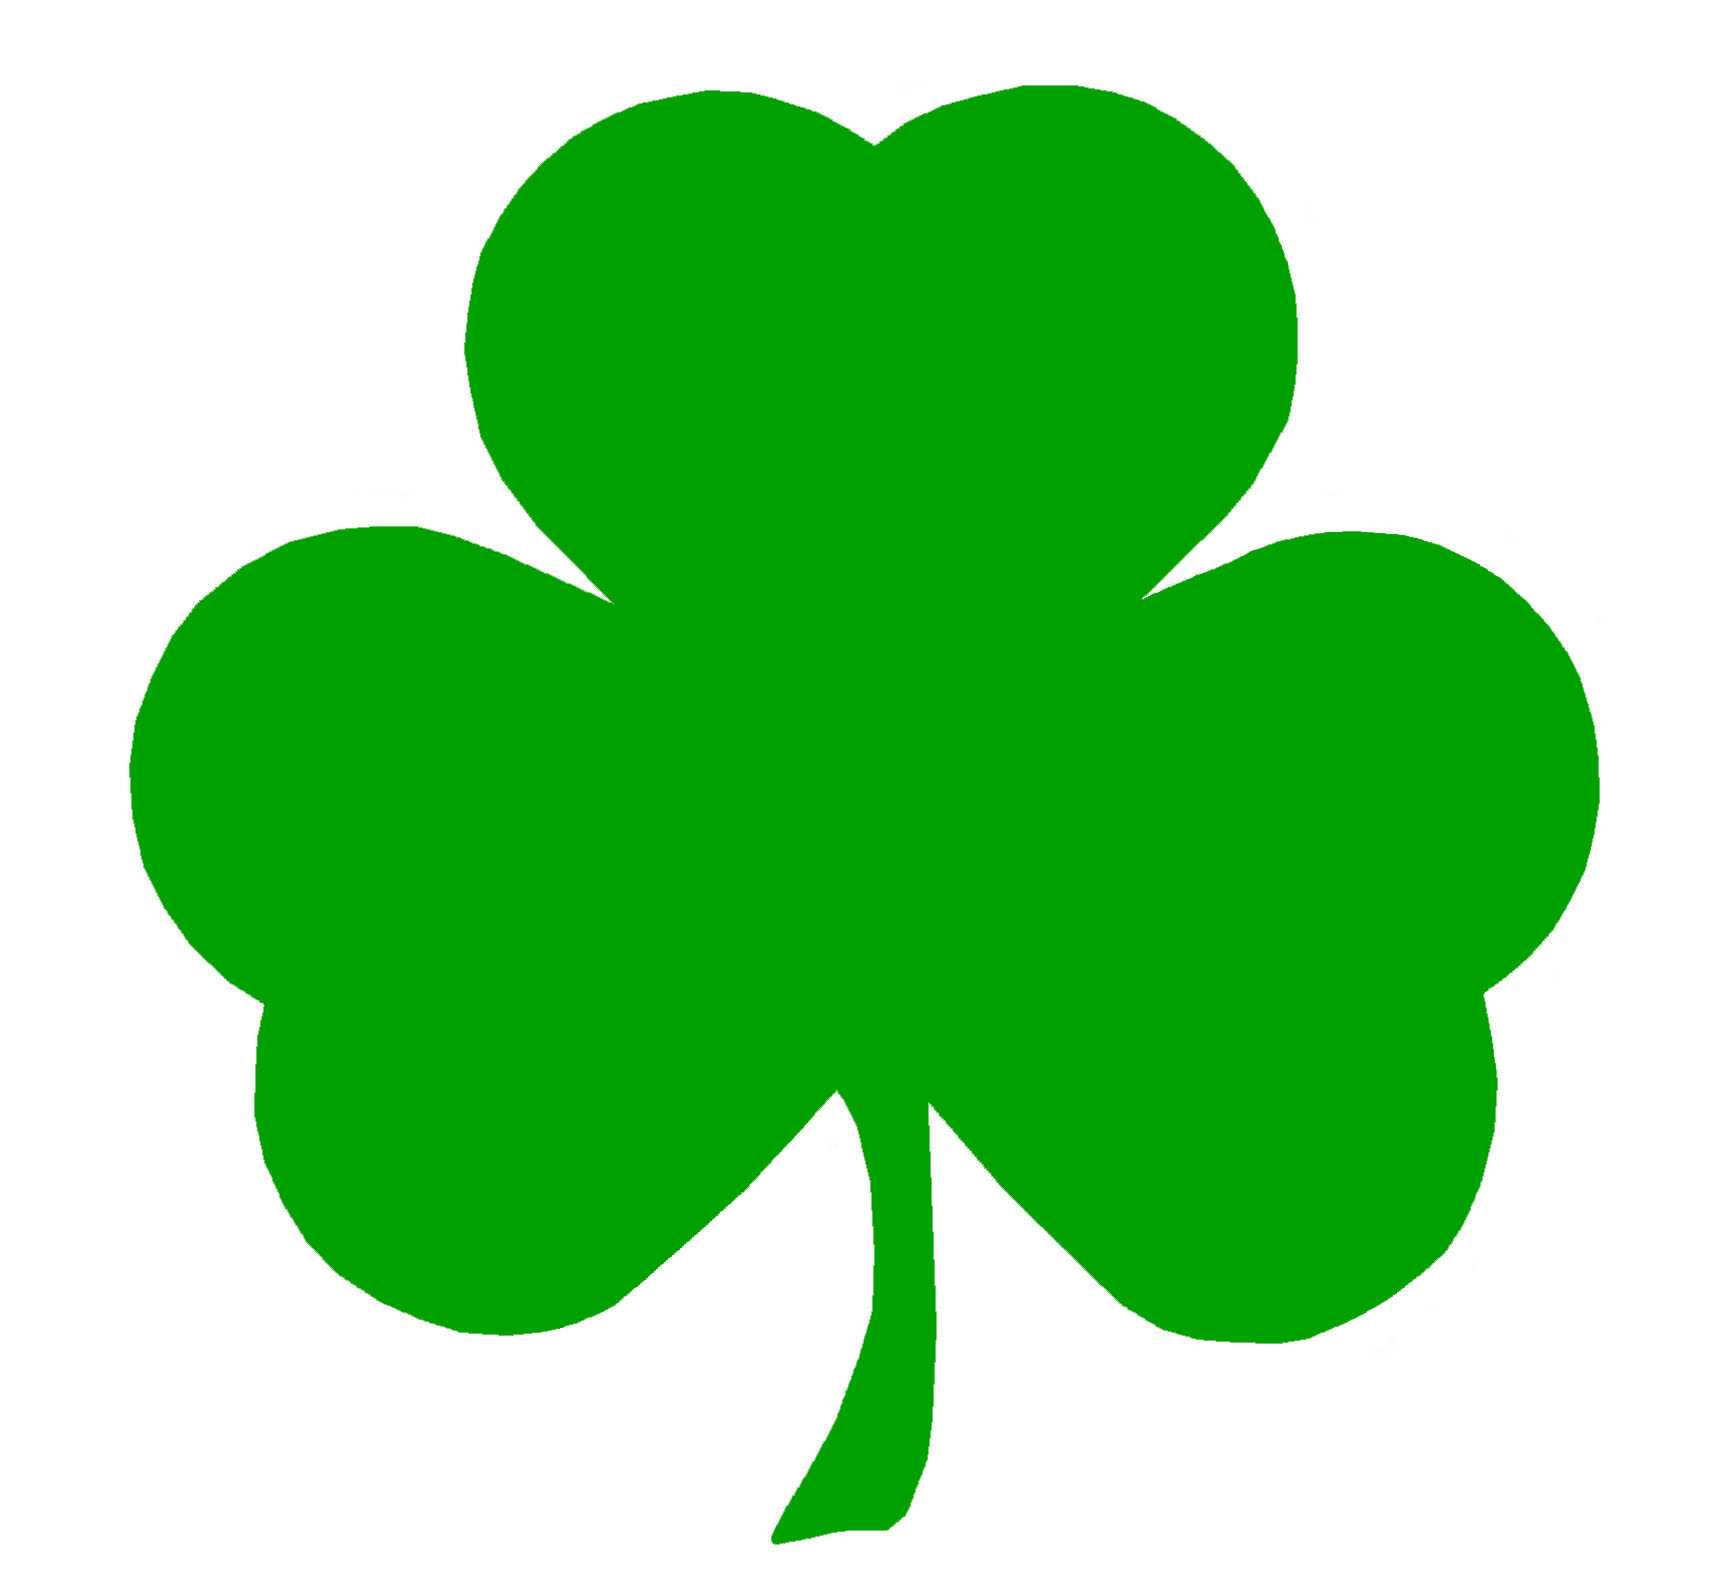 Irish Clover Clipart-Irish Clover Clipart-7